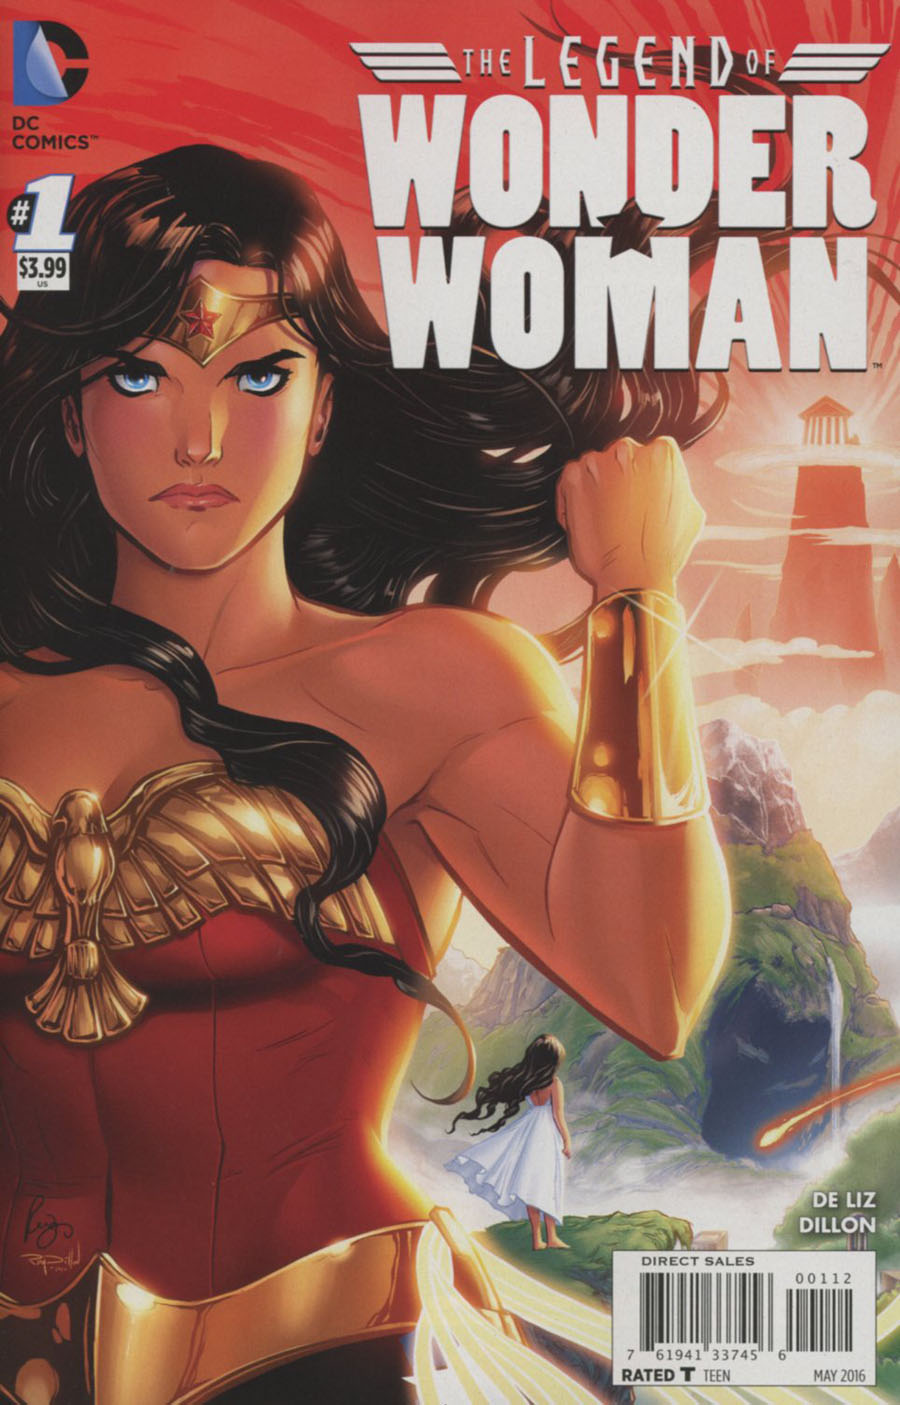 Legend Of Wonder Woman Vol 2 #1 Cover C 2nd Ptg Renae De Liz Variant Cover